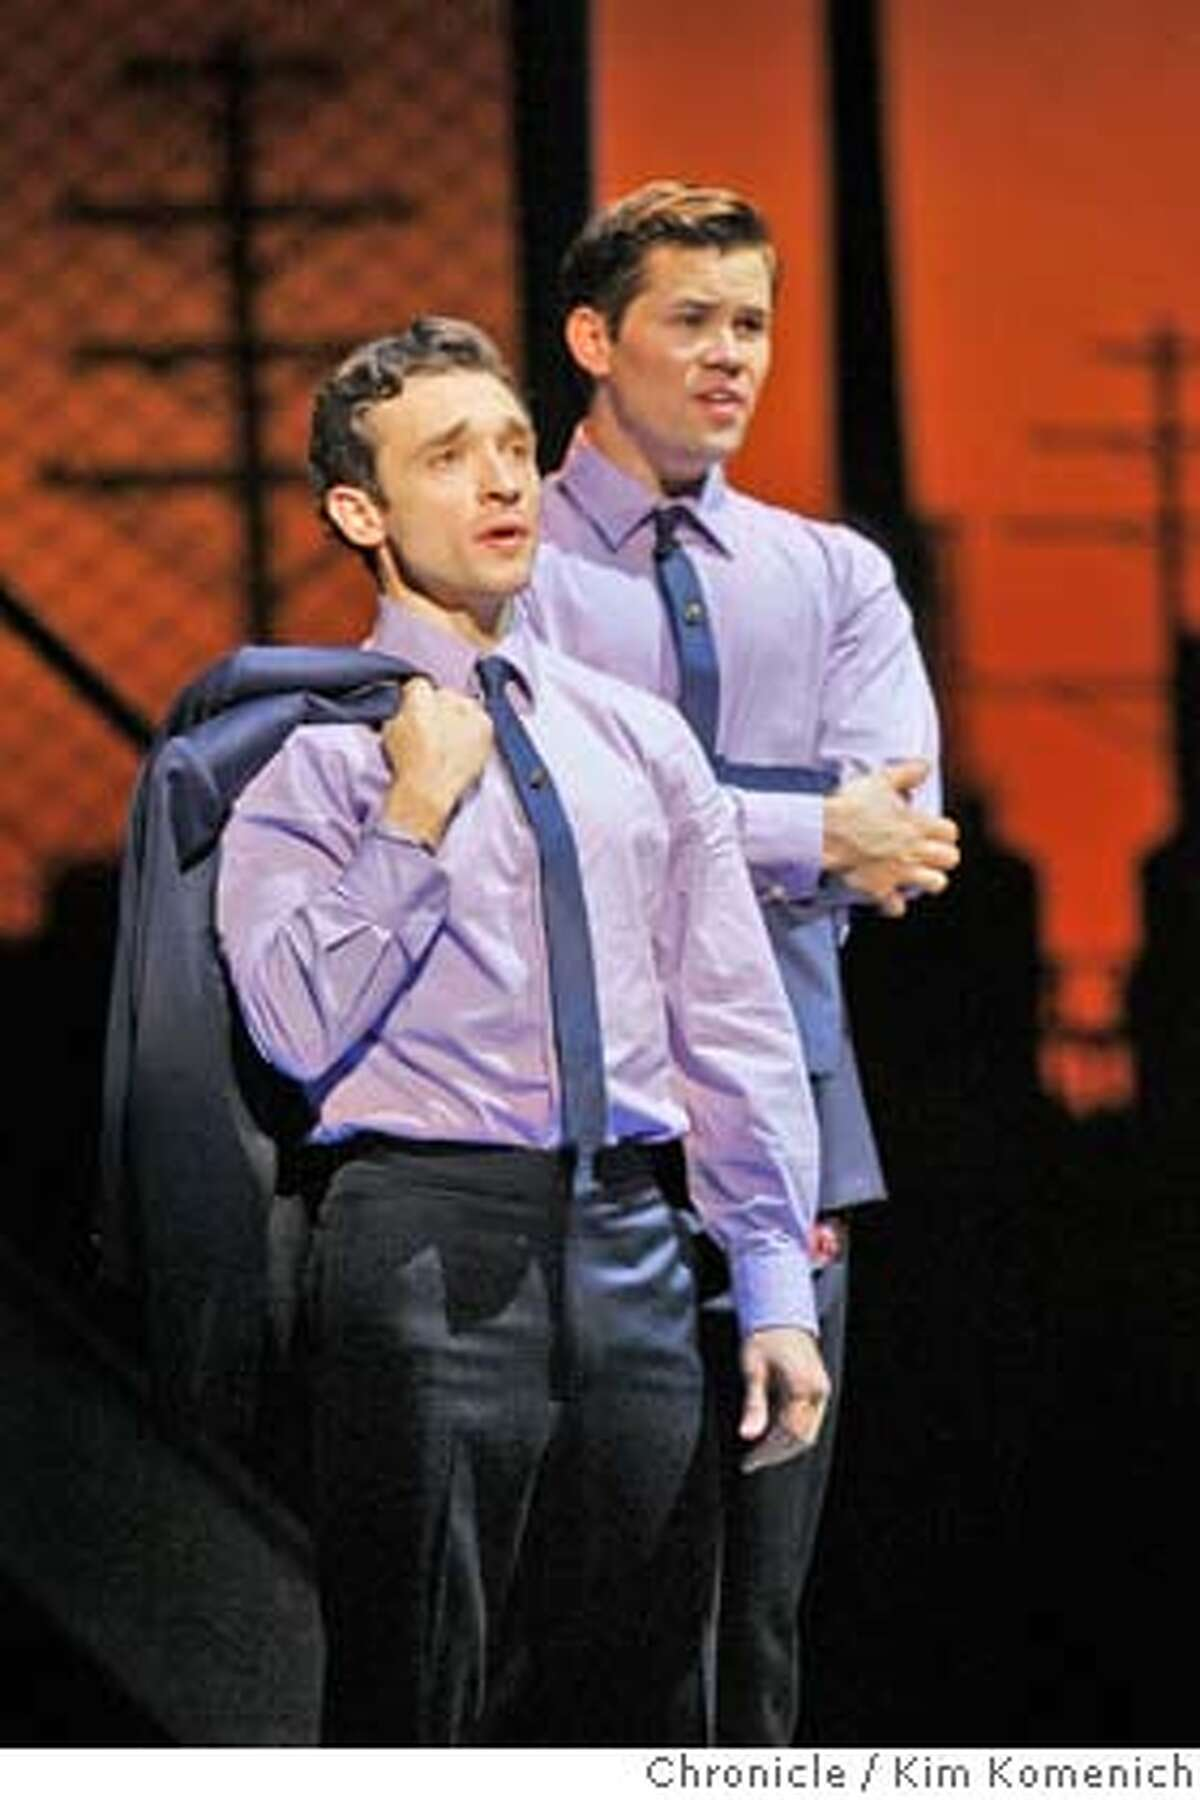 JERSEY03_012_KK.JPG Rick Faugno as Frankie Valli, (L) Andrew Rannells as Bob Gaudio sing as the Broadway hit